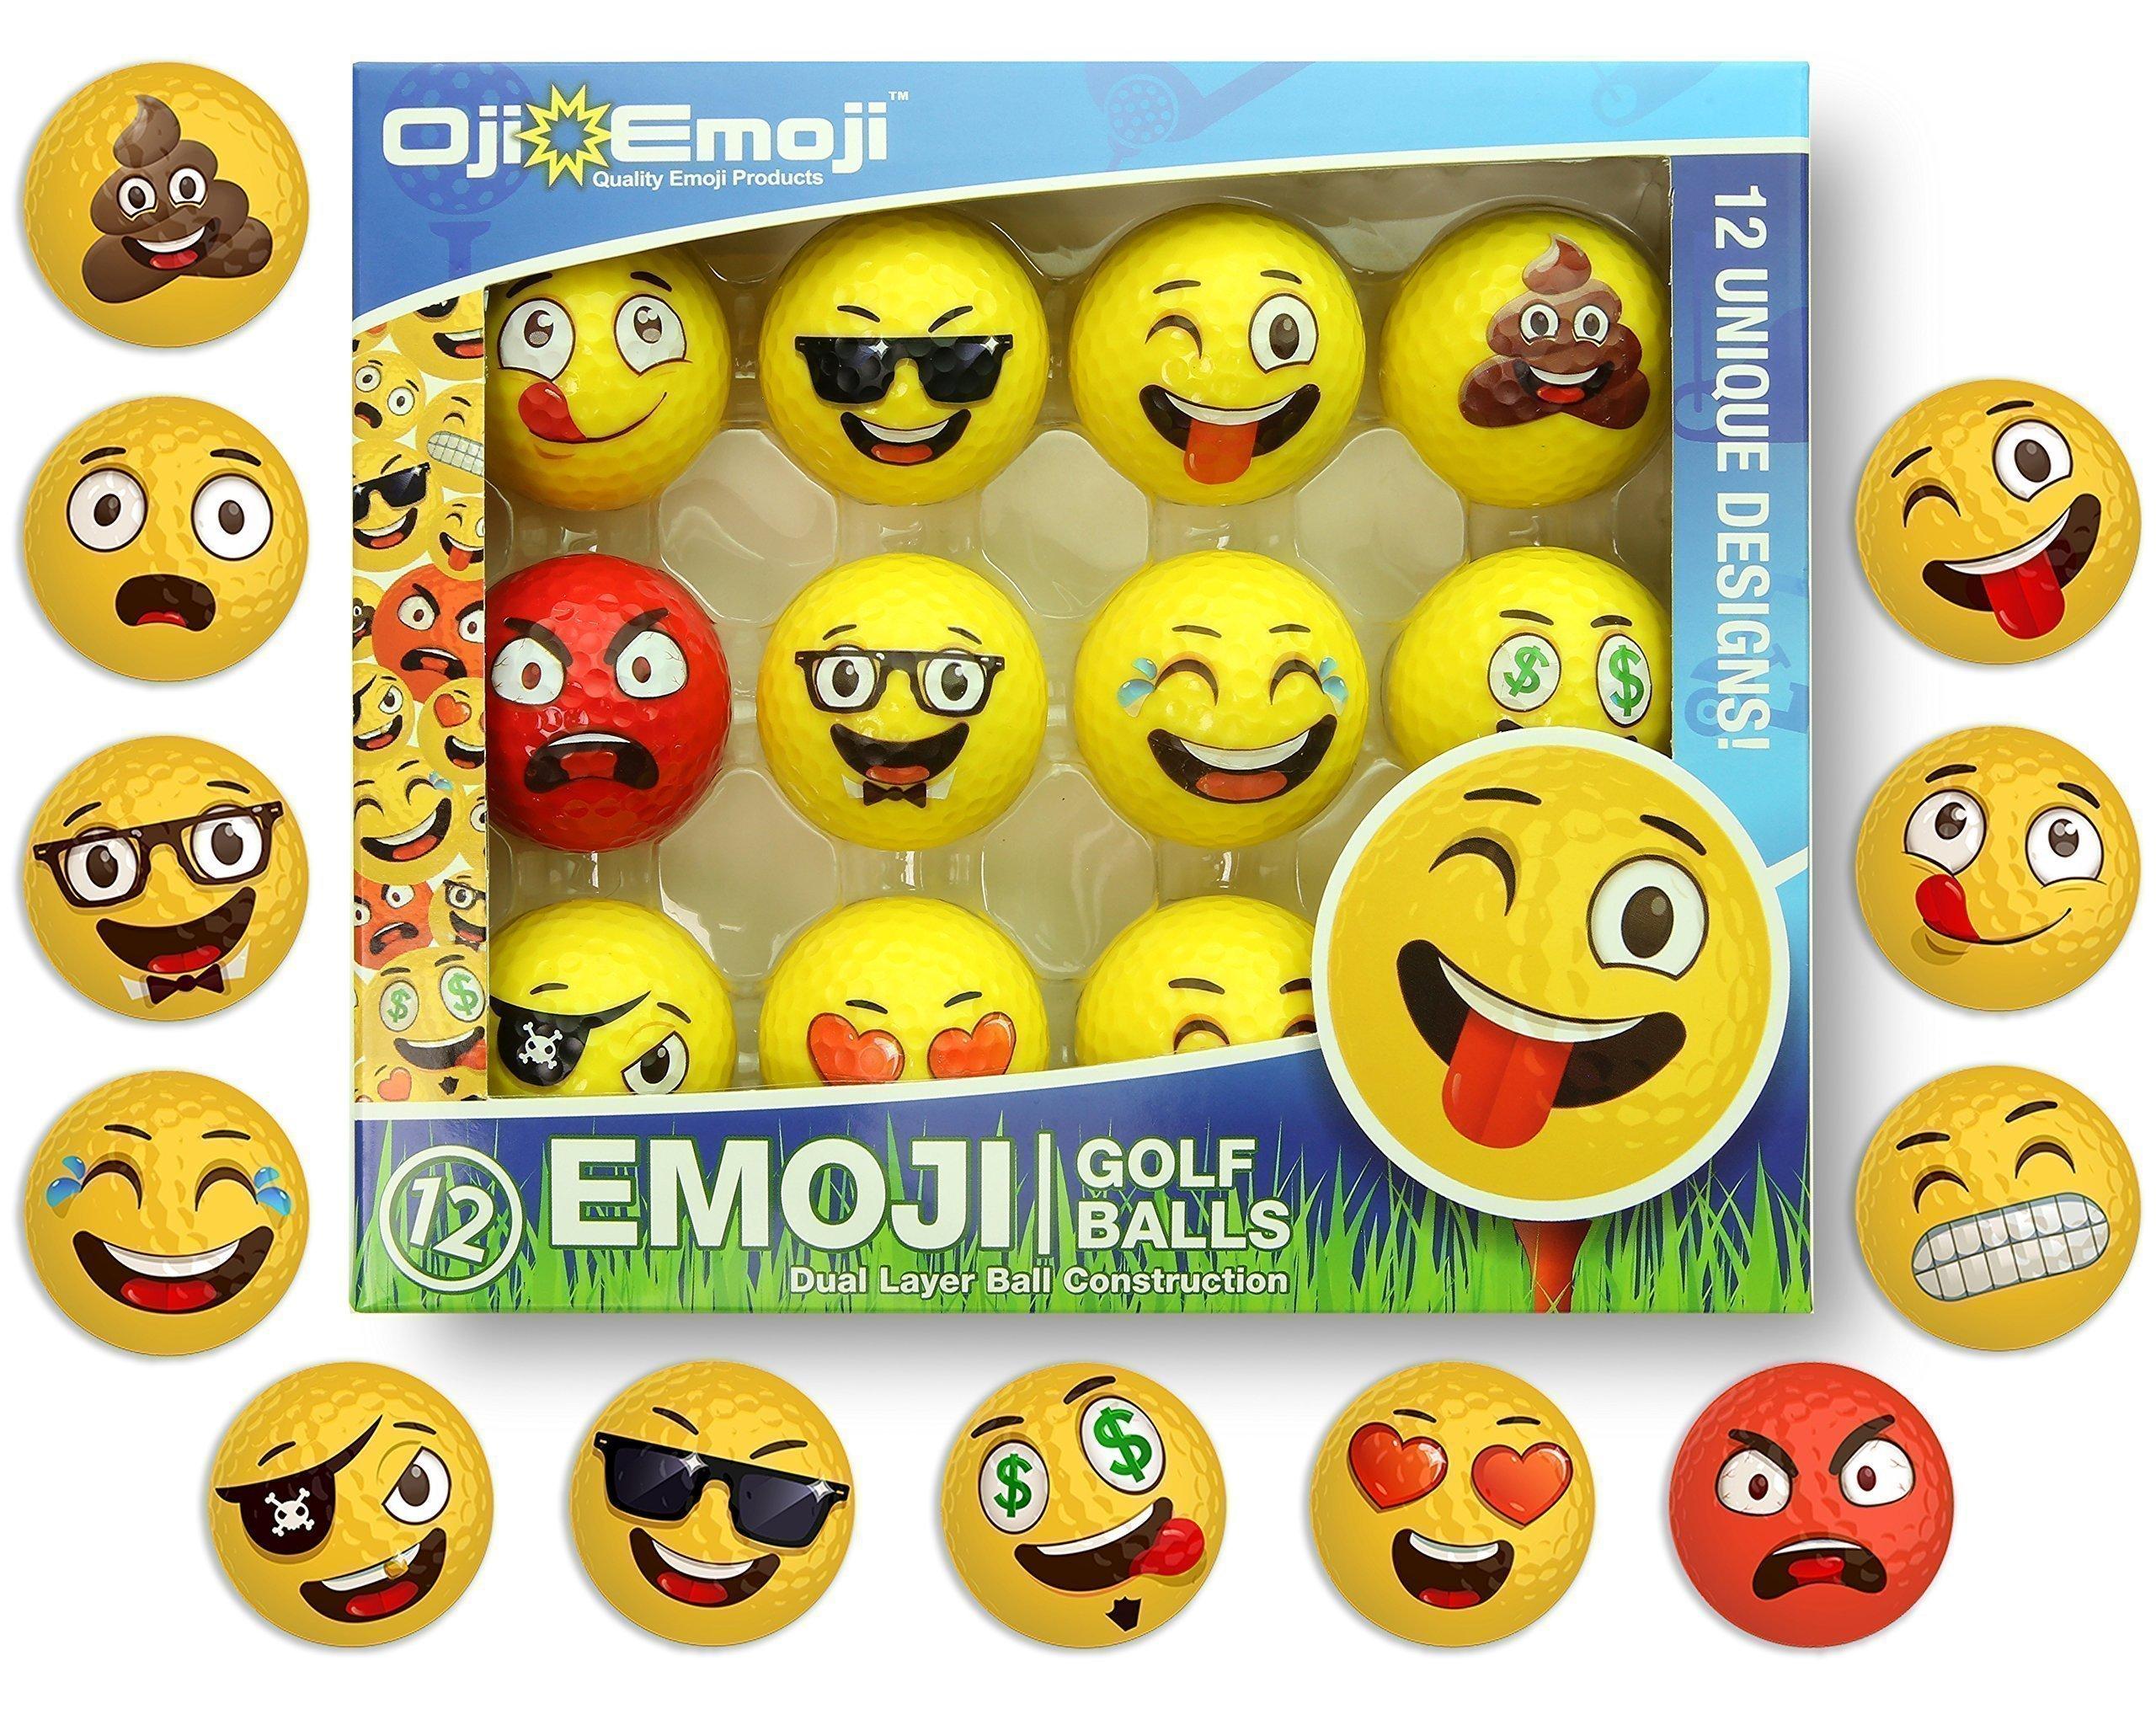 Oji-Emoji Premium Emoji Golf Balls, Unique Dual-Layer Professional Practice Golf Balls, 12-Pack Emoji Golfer Novelty Gag Gifts for All Golfers, Fun Golf Gift for Dads, Guys, Men, Women, Kids, Grandpa